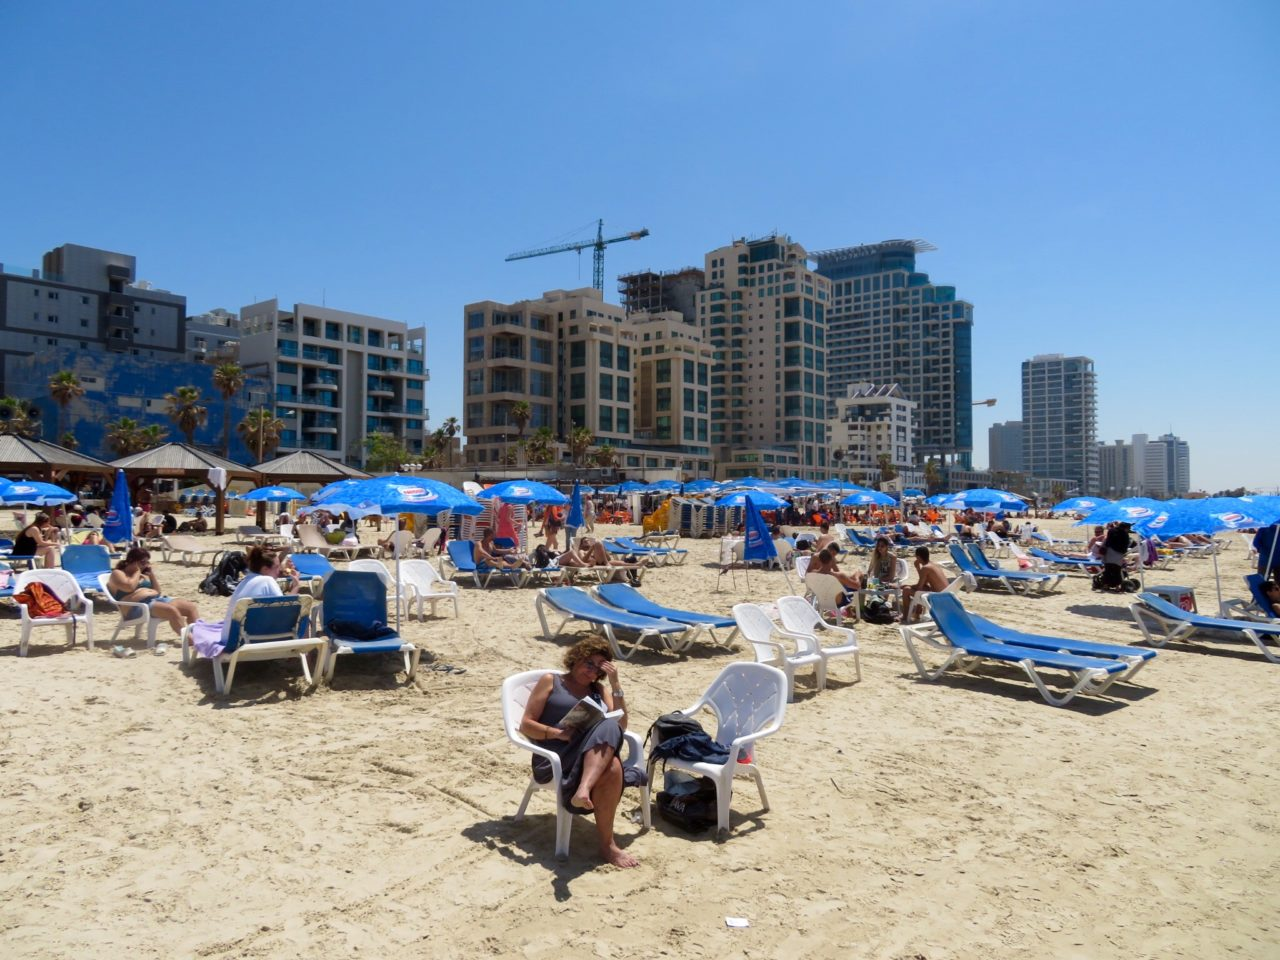 Tel Aviv Beach : Another facet of the Tel Aviv Beach